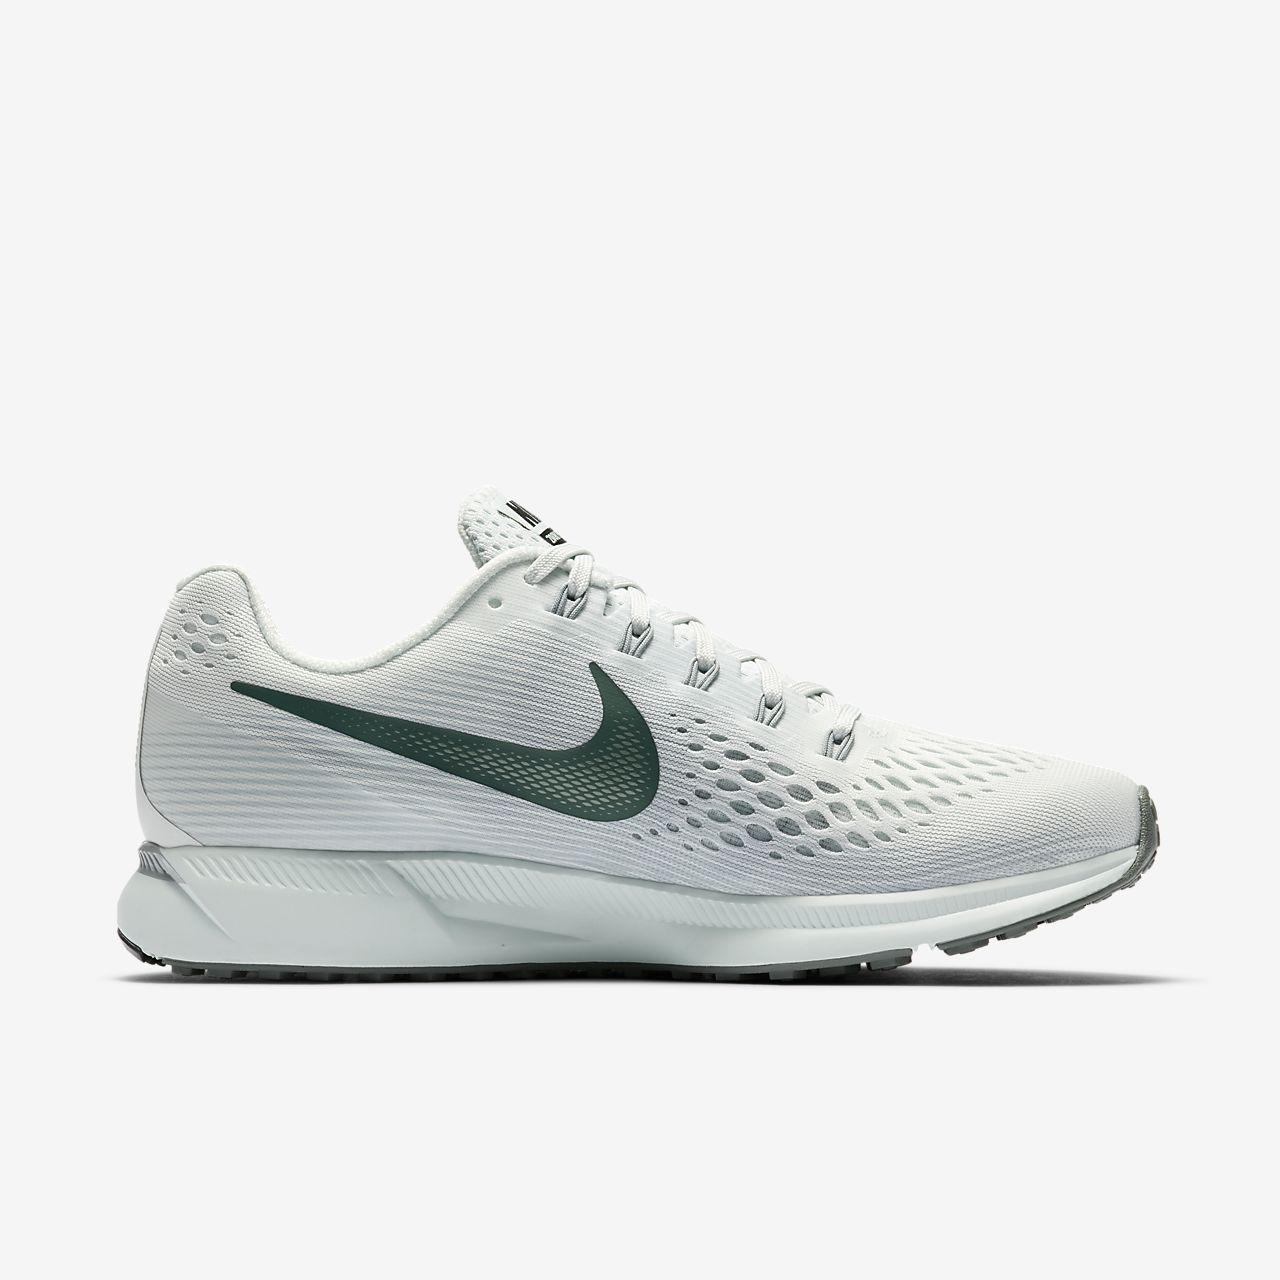 scarpe nike misura 34